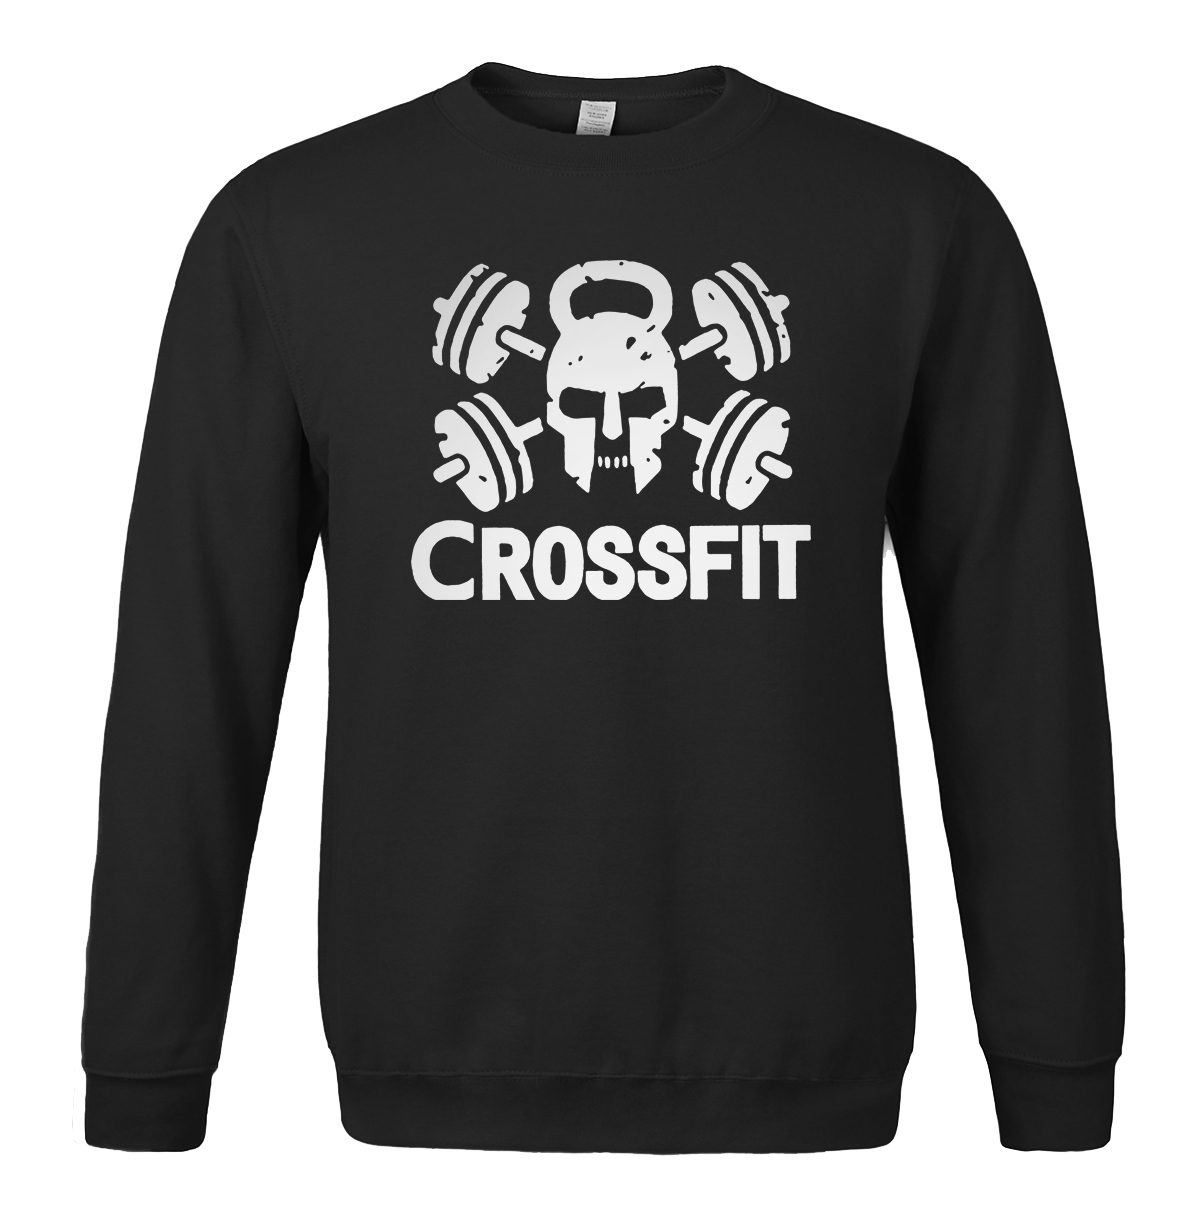 2019 spring winter hoodie sweatshirt CROSSFIT letter printed hoody fleece high quality fitness brand clothing hip hop tracksuits